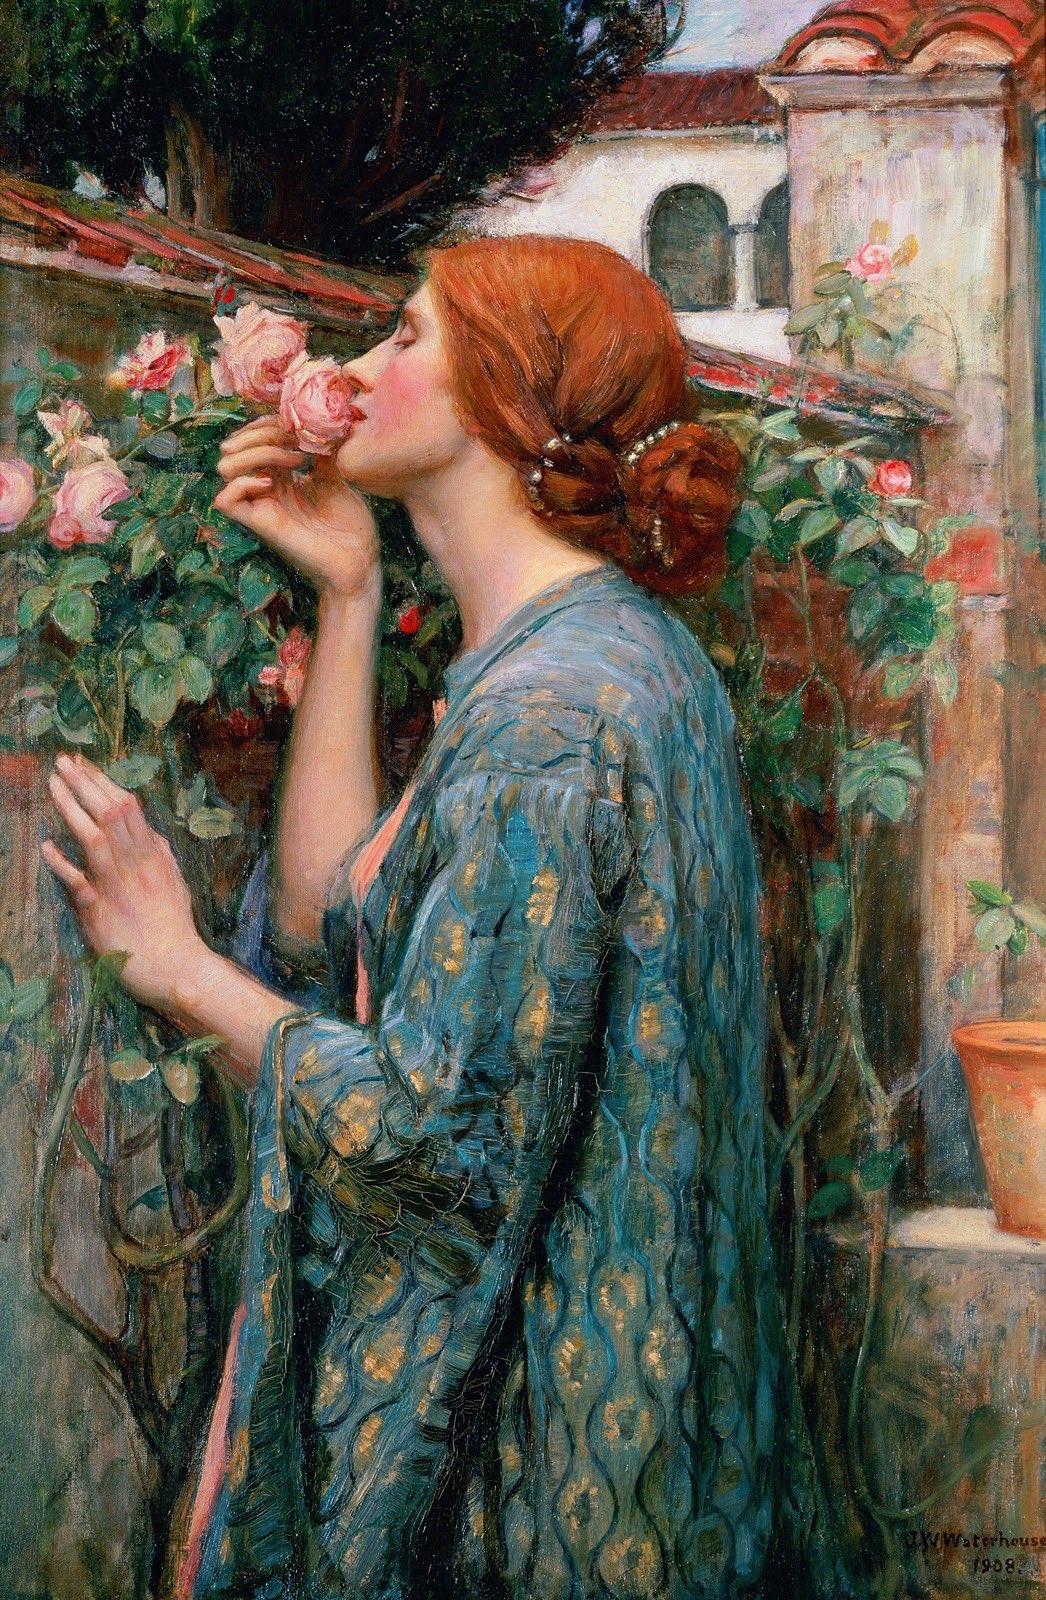 Girl kissing roses petals